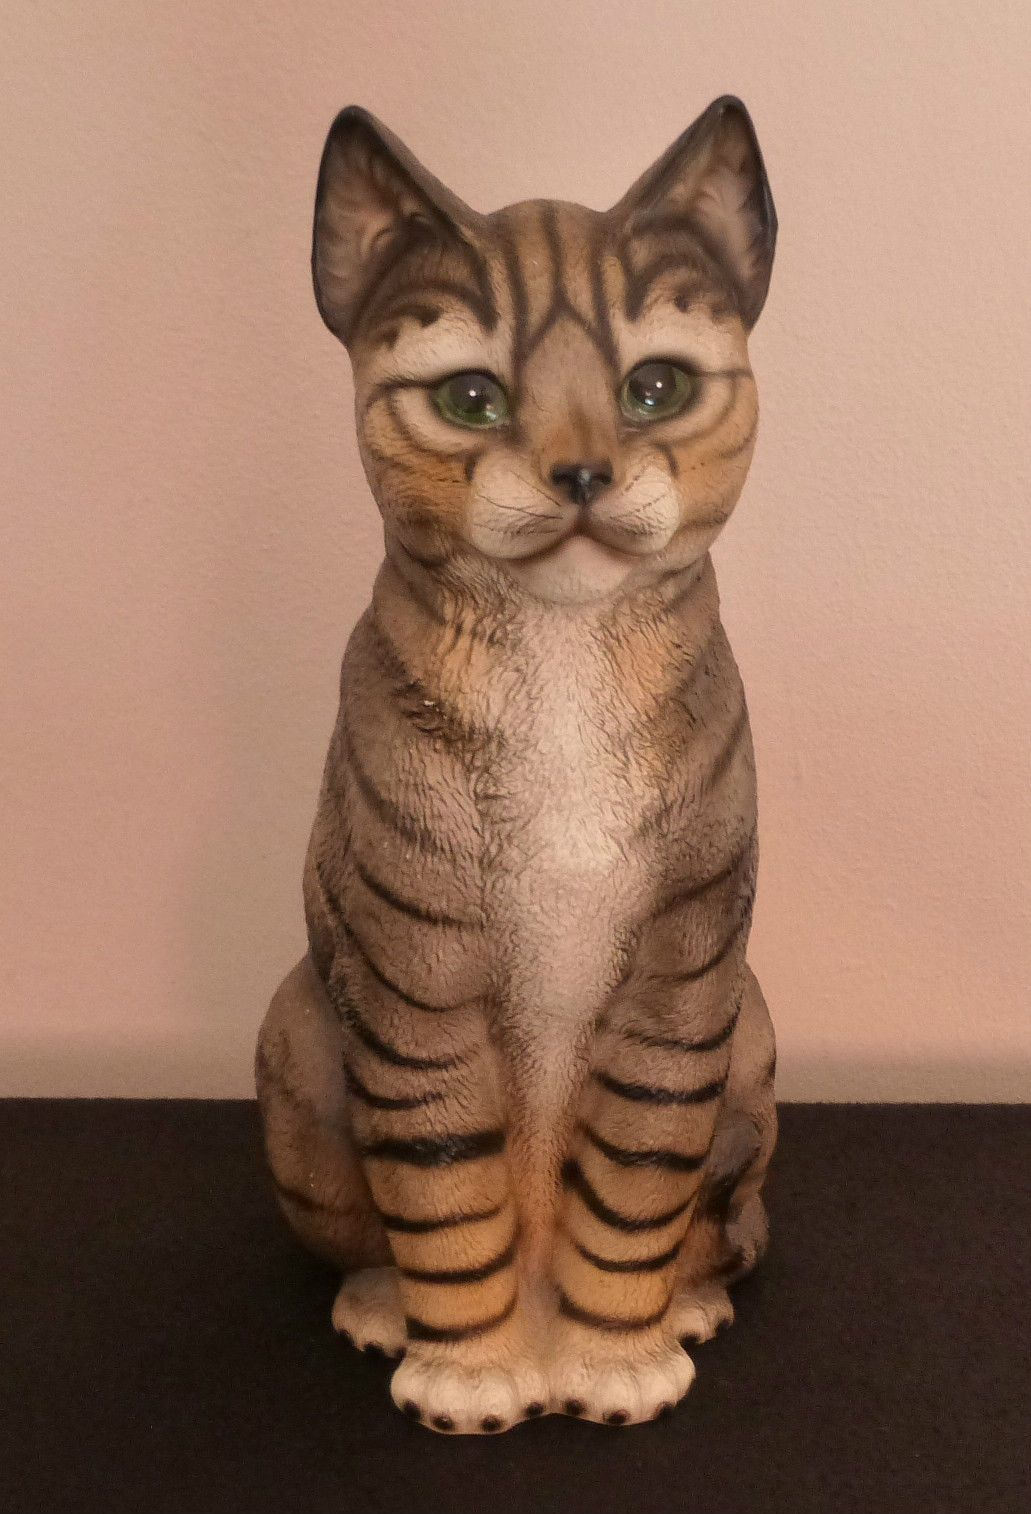 Harvey Knox Ceramic Tabby Cat Figurine 11 Inches